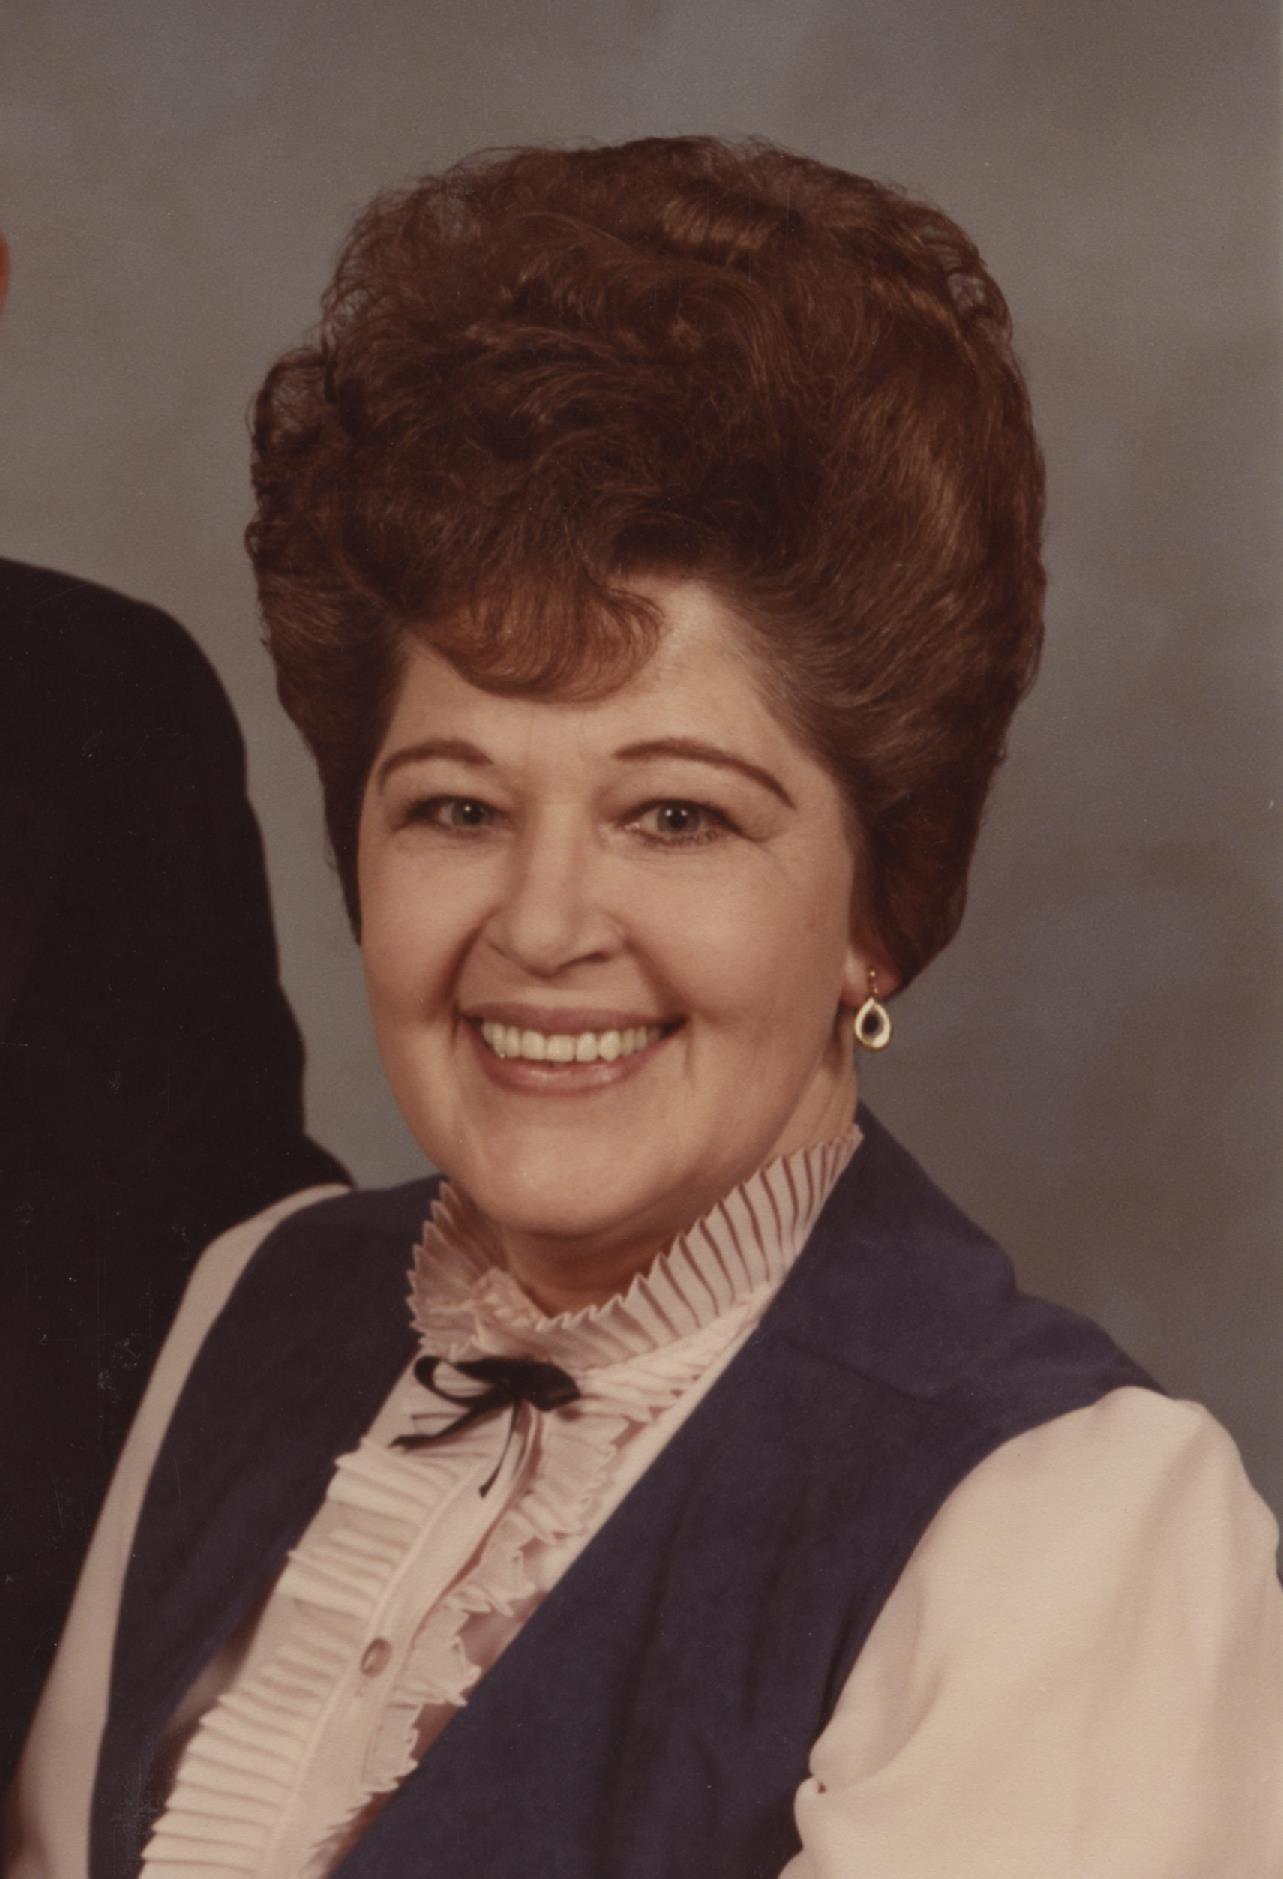 Carol Ann Astrike, age 82, of Winslow